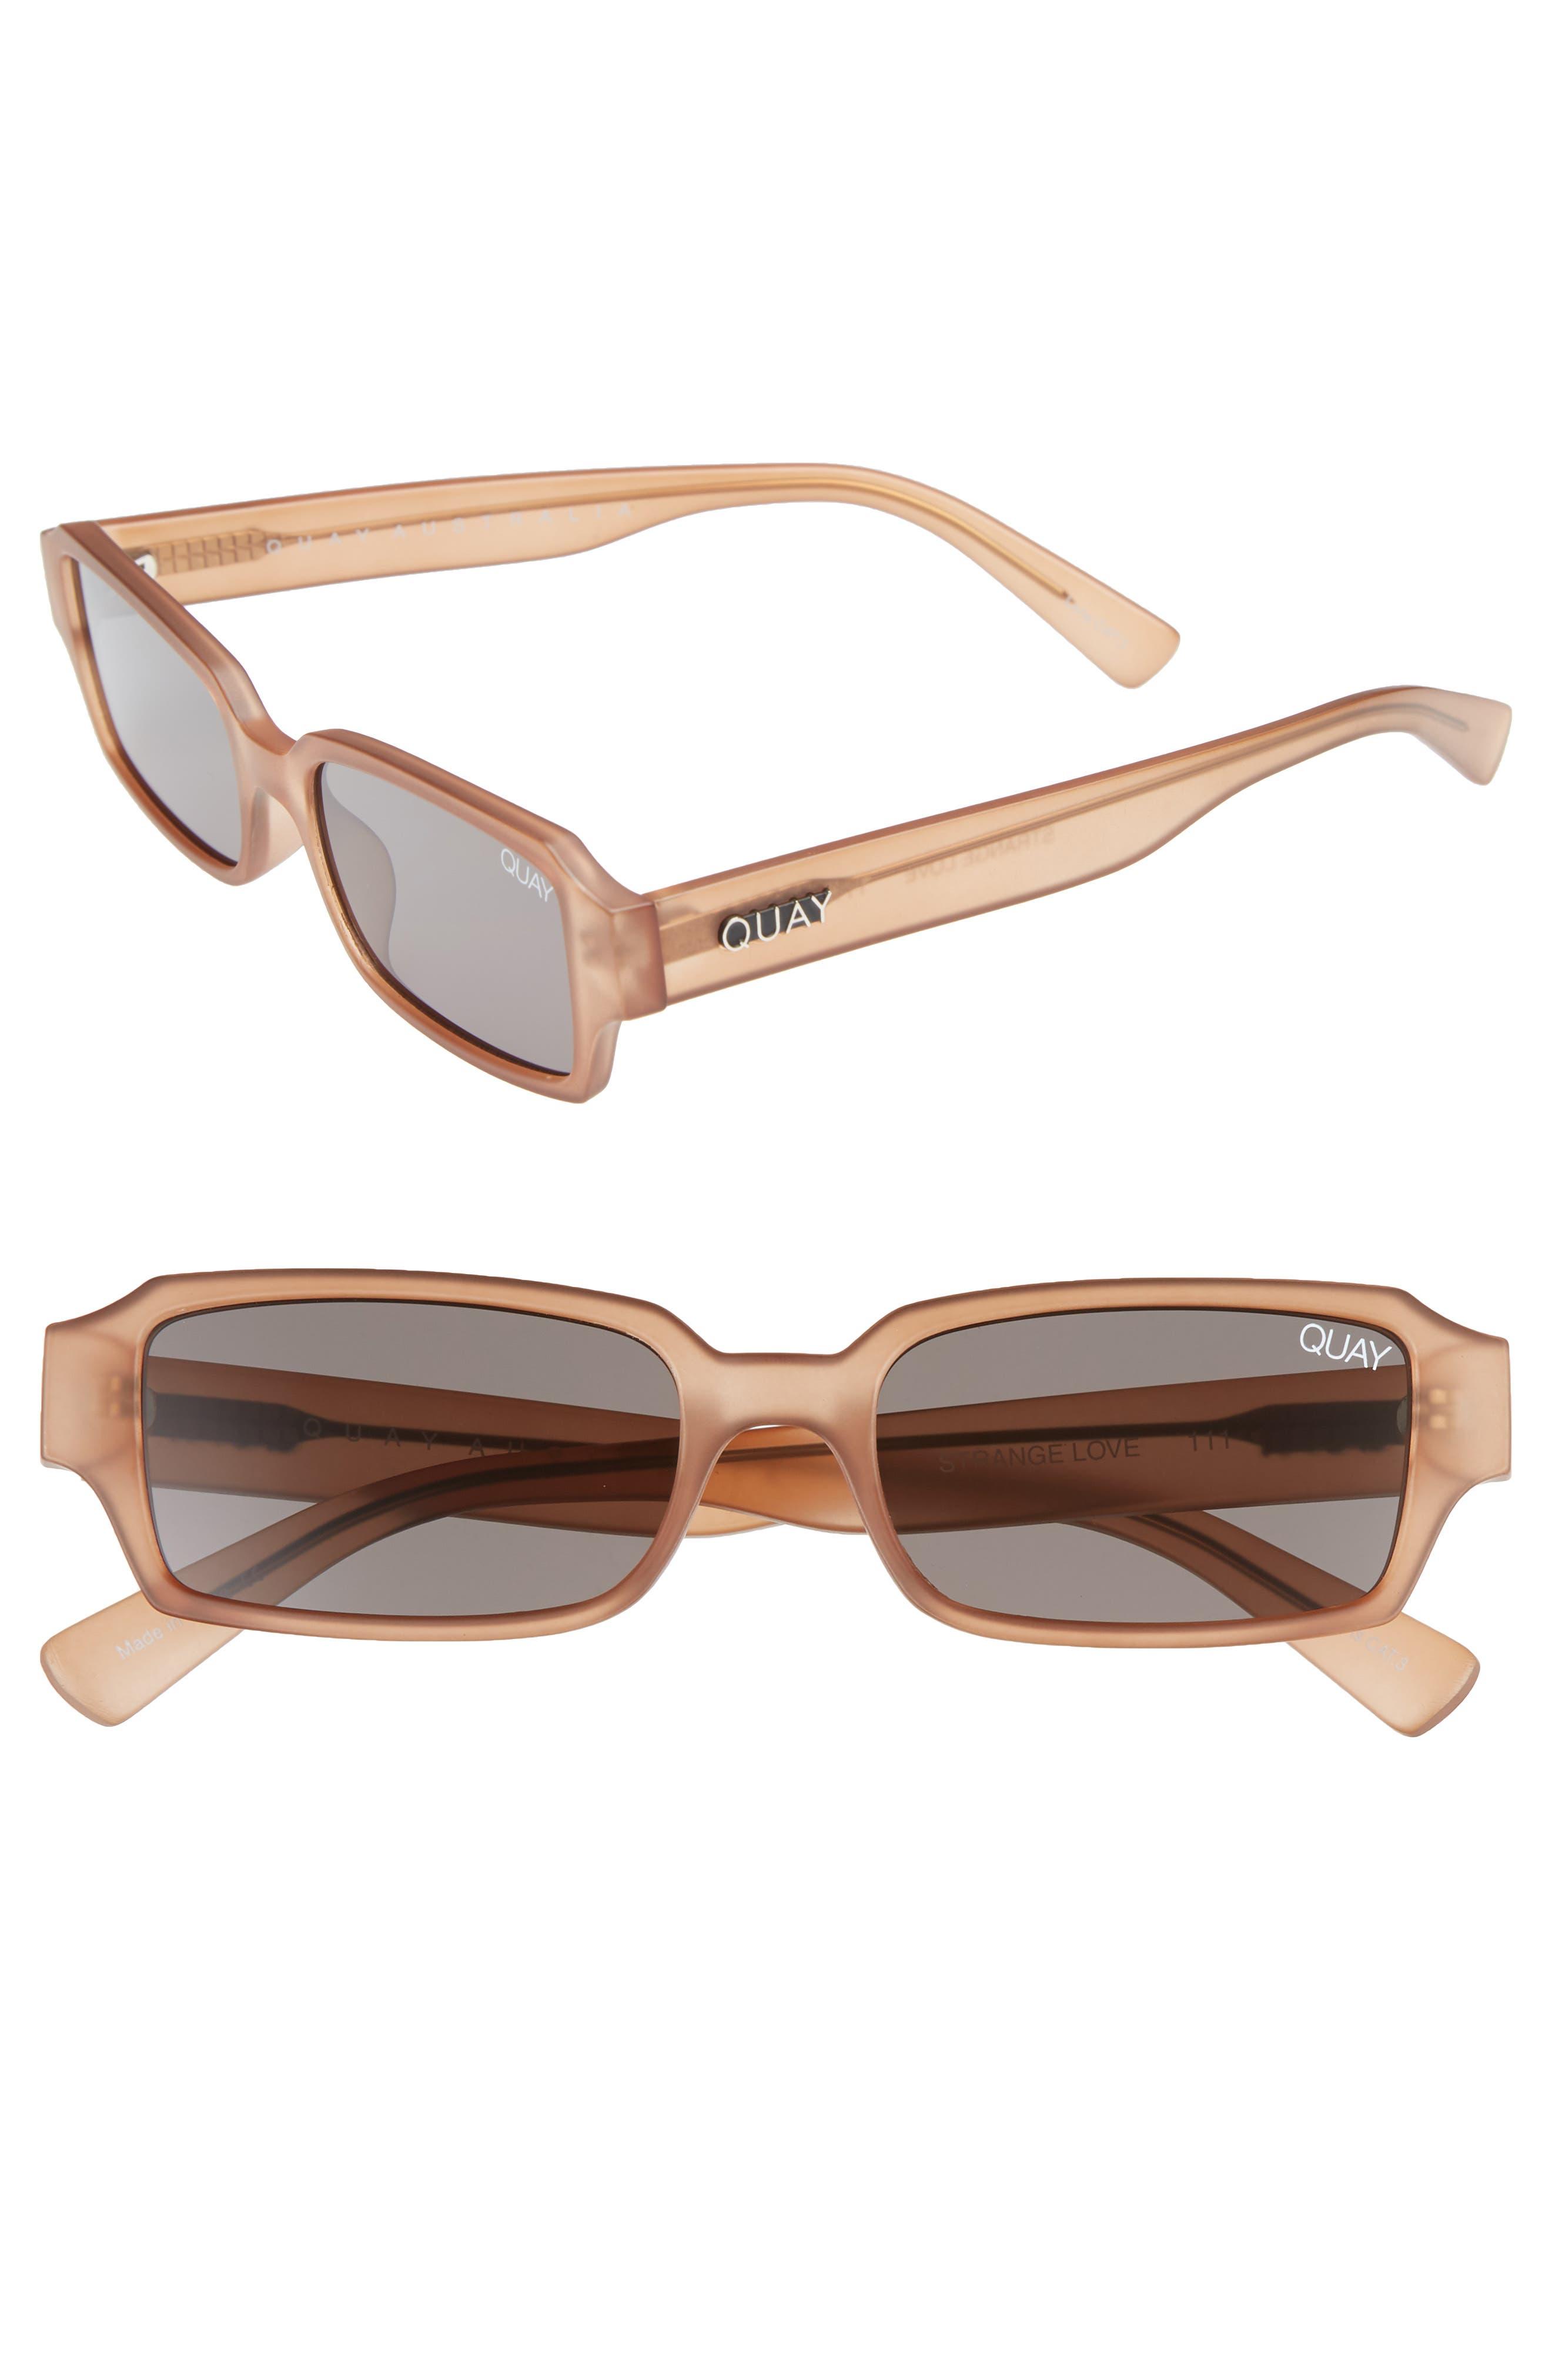 6321d3b2bcea9 Quay Australia Strange Love 5m Rectangle Sunglasses - Brown  Smoke